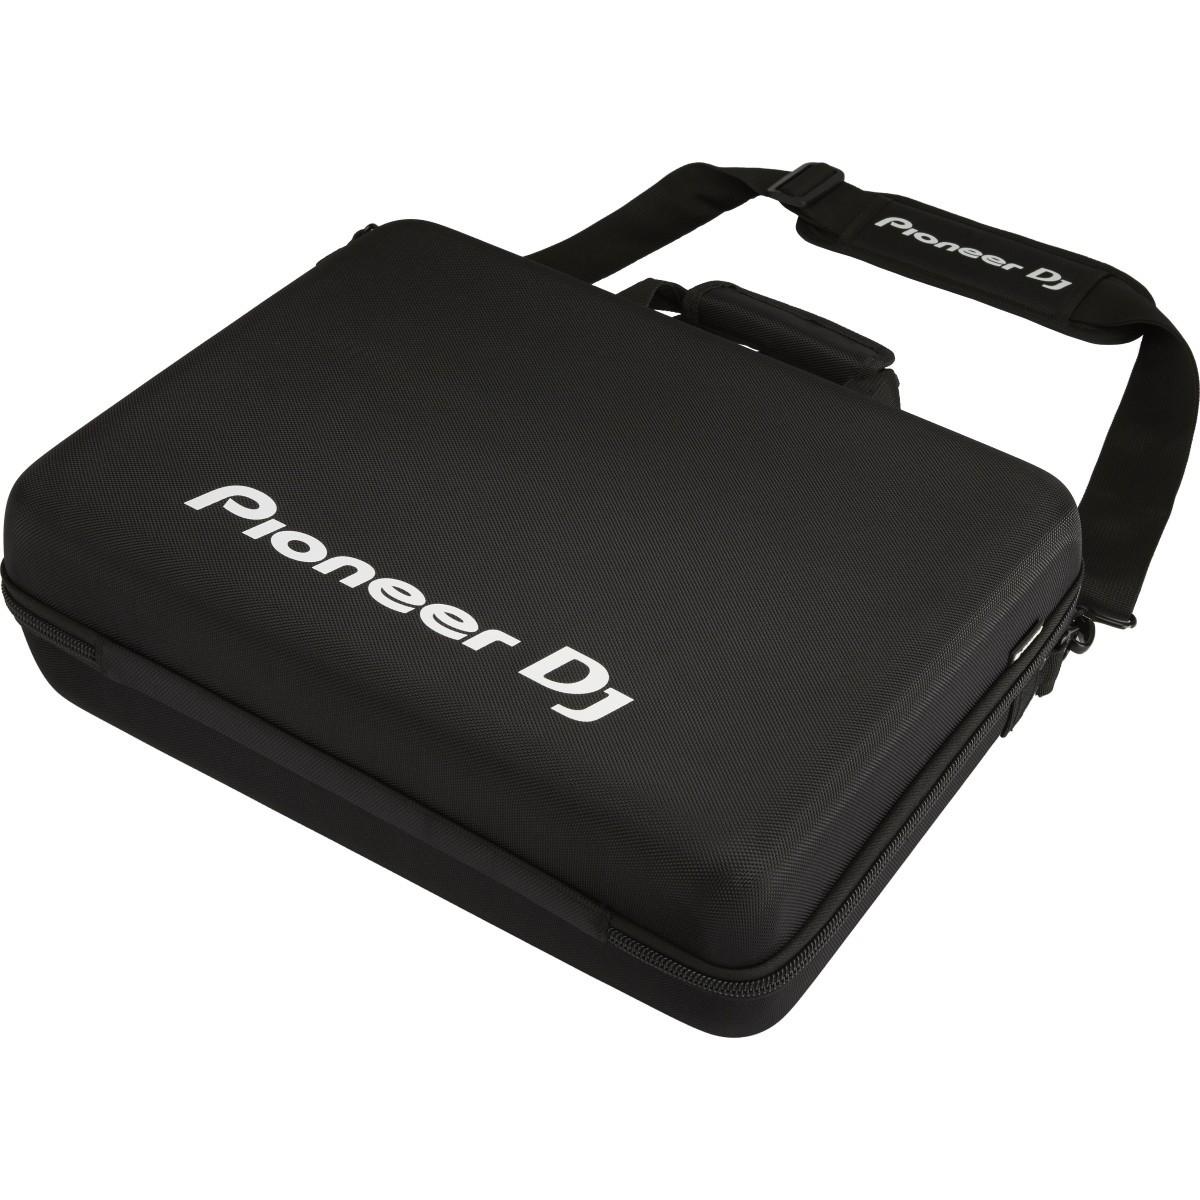 BORSA PIONEER DJC-S9 PER DJM-S9